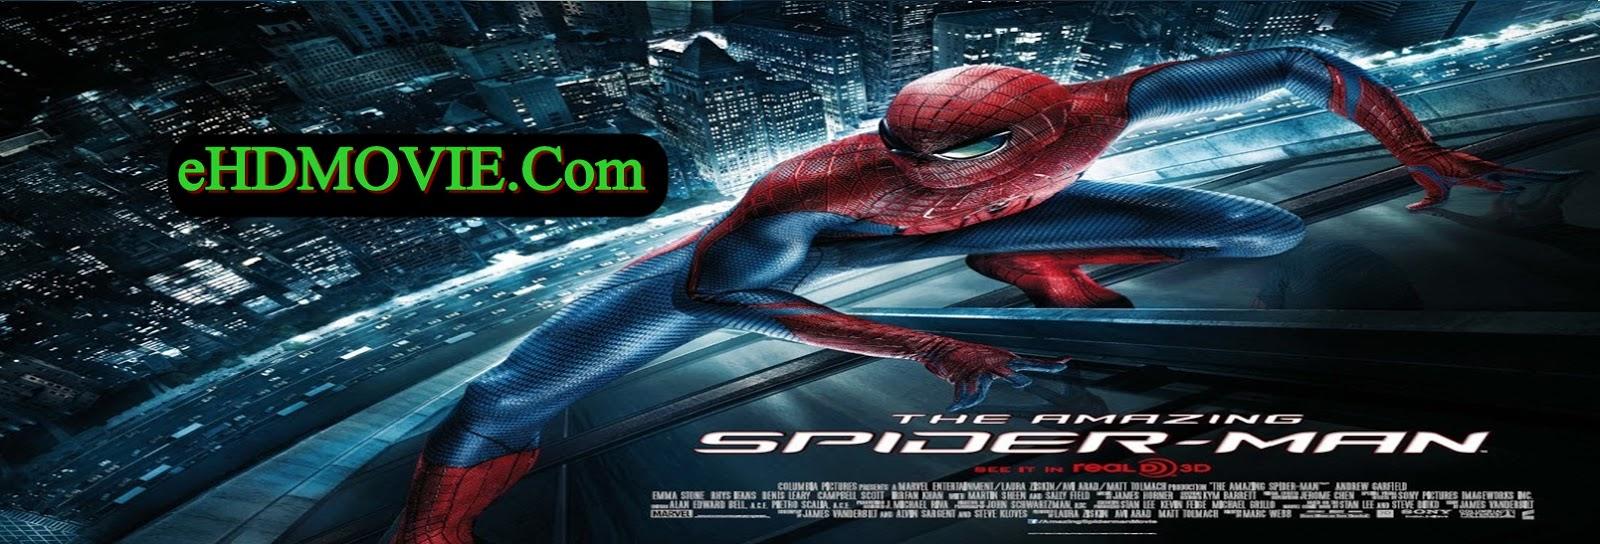 The Amazing Spider-Man 2012 Full Movie Dual Audio [Hindi – English] 1080p - 720p - 480p ORG BRRip 350MB - 1.2GB - 2.2GB ESubs Free Download